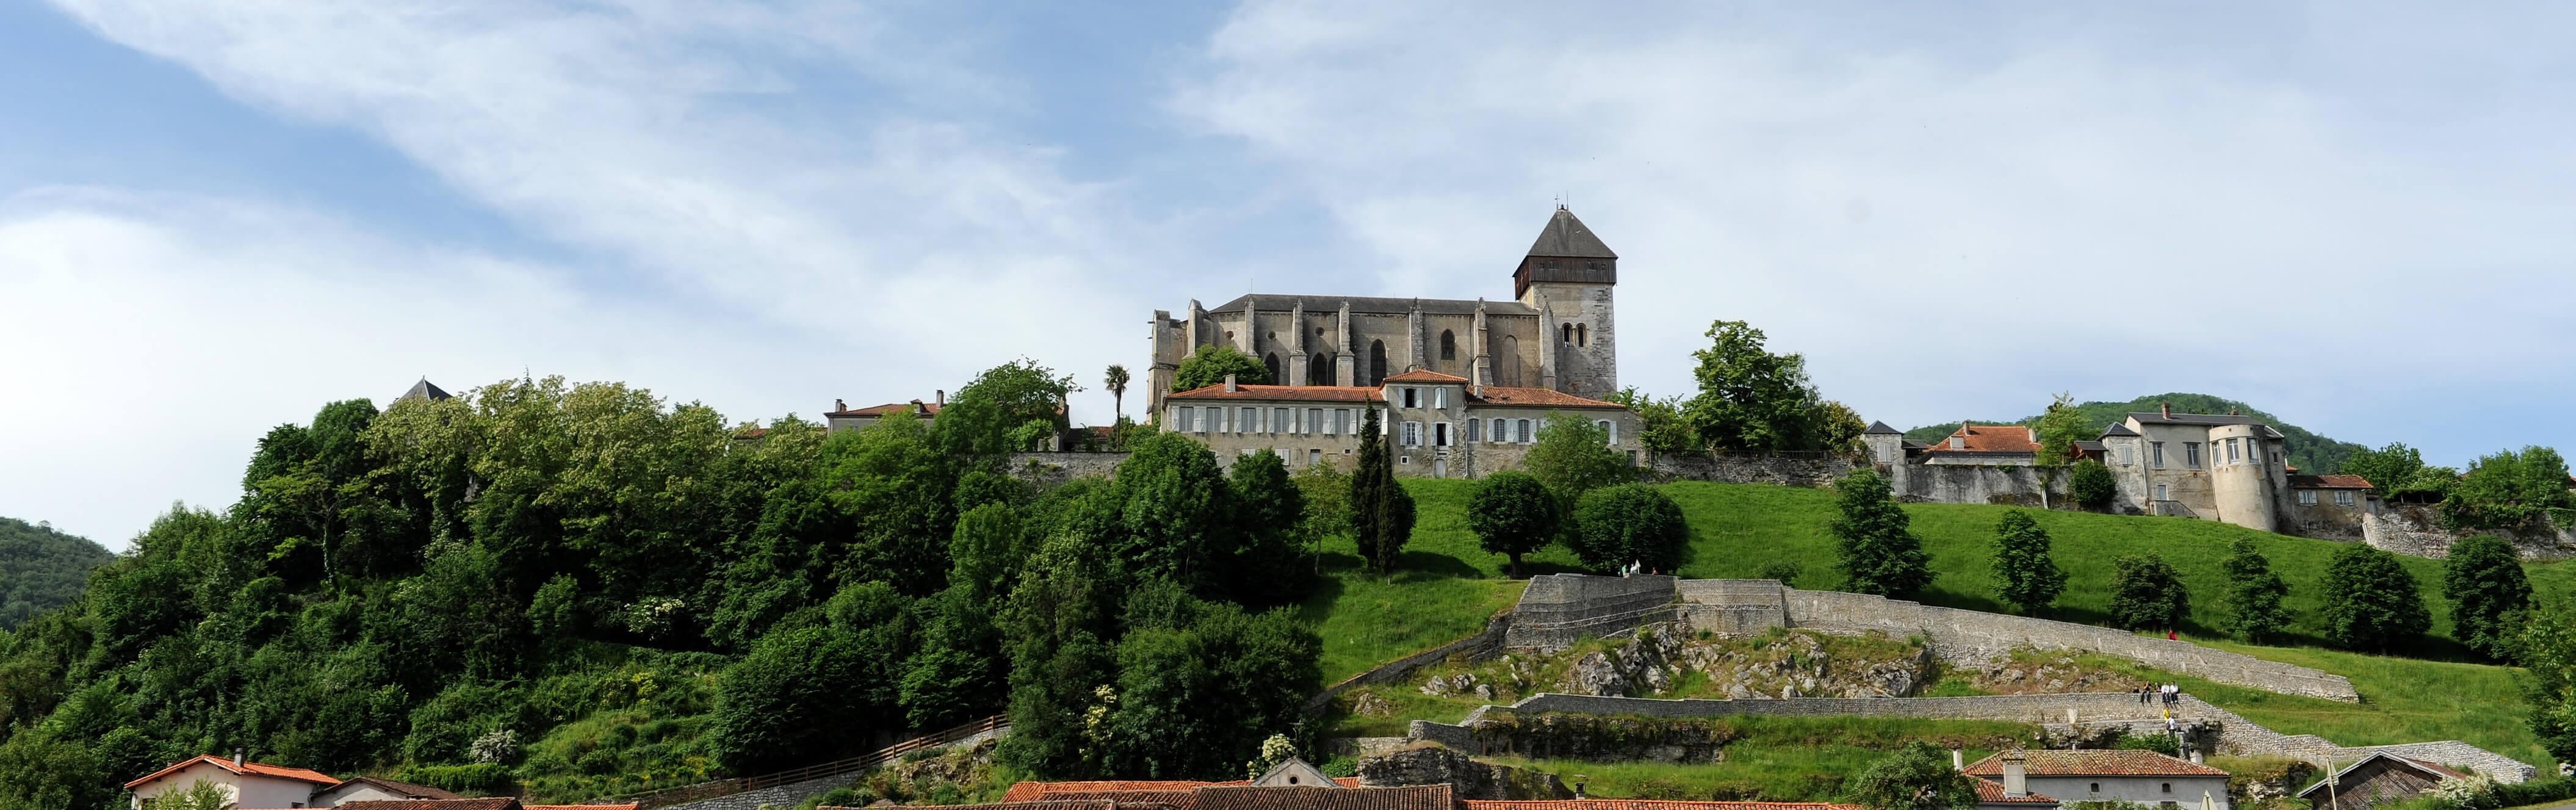 Ancienne cathédrale Notre-Dame©ACIR / JJ Gelbart